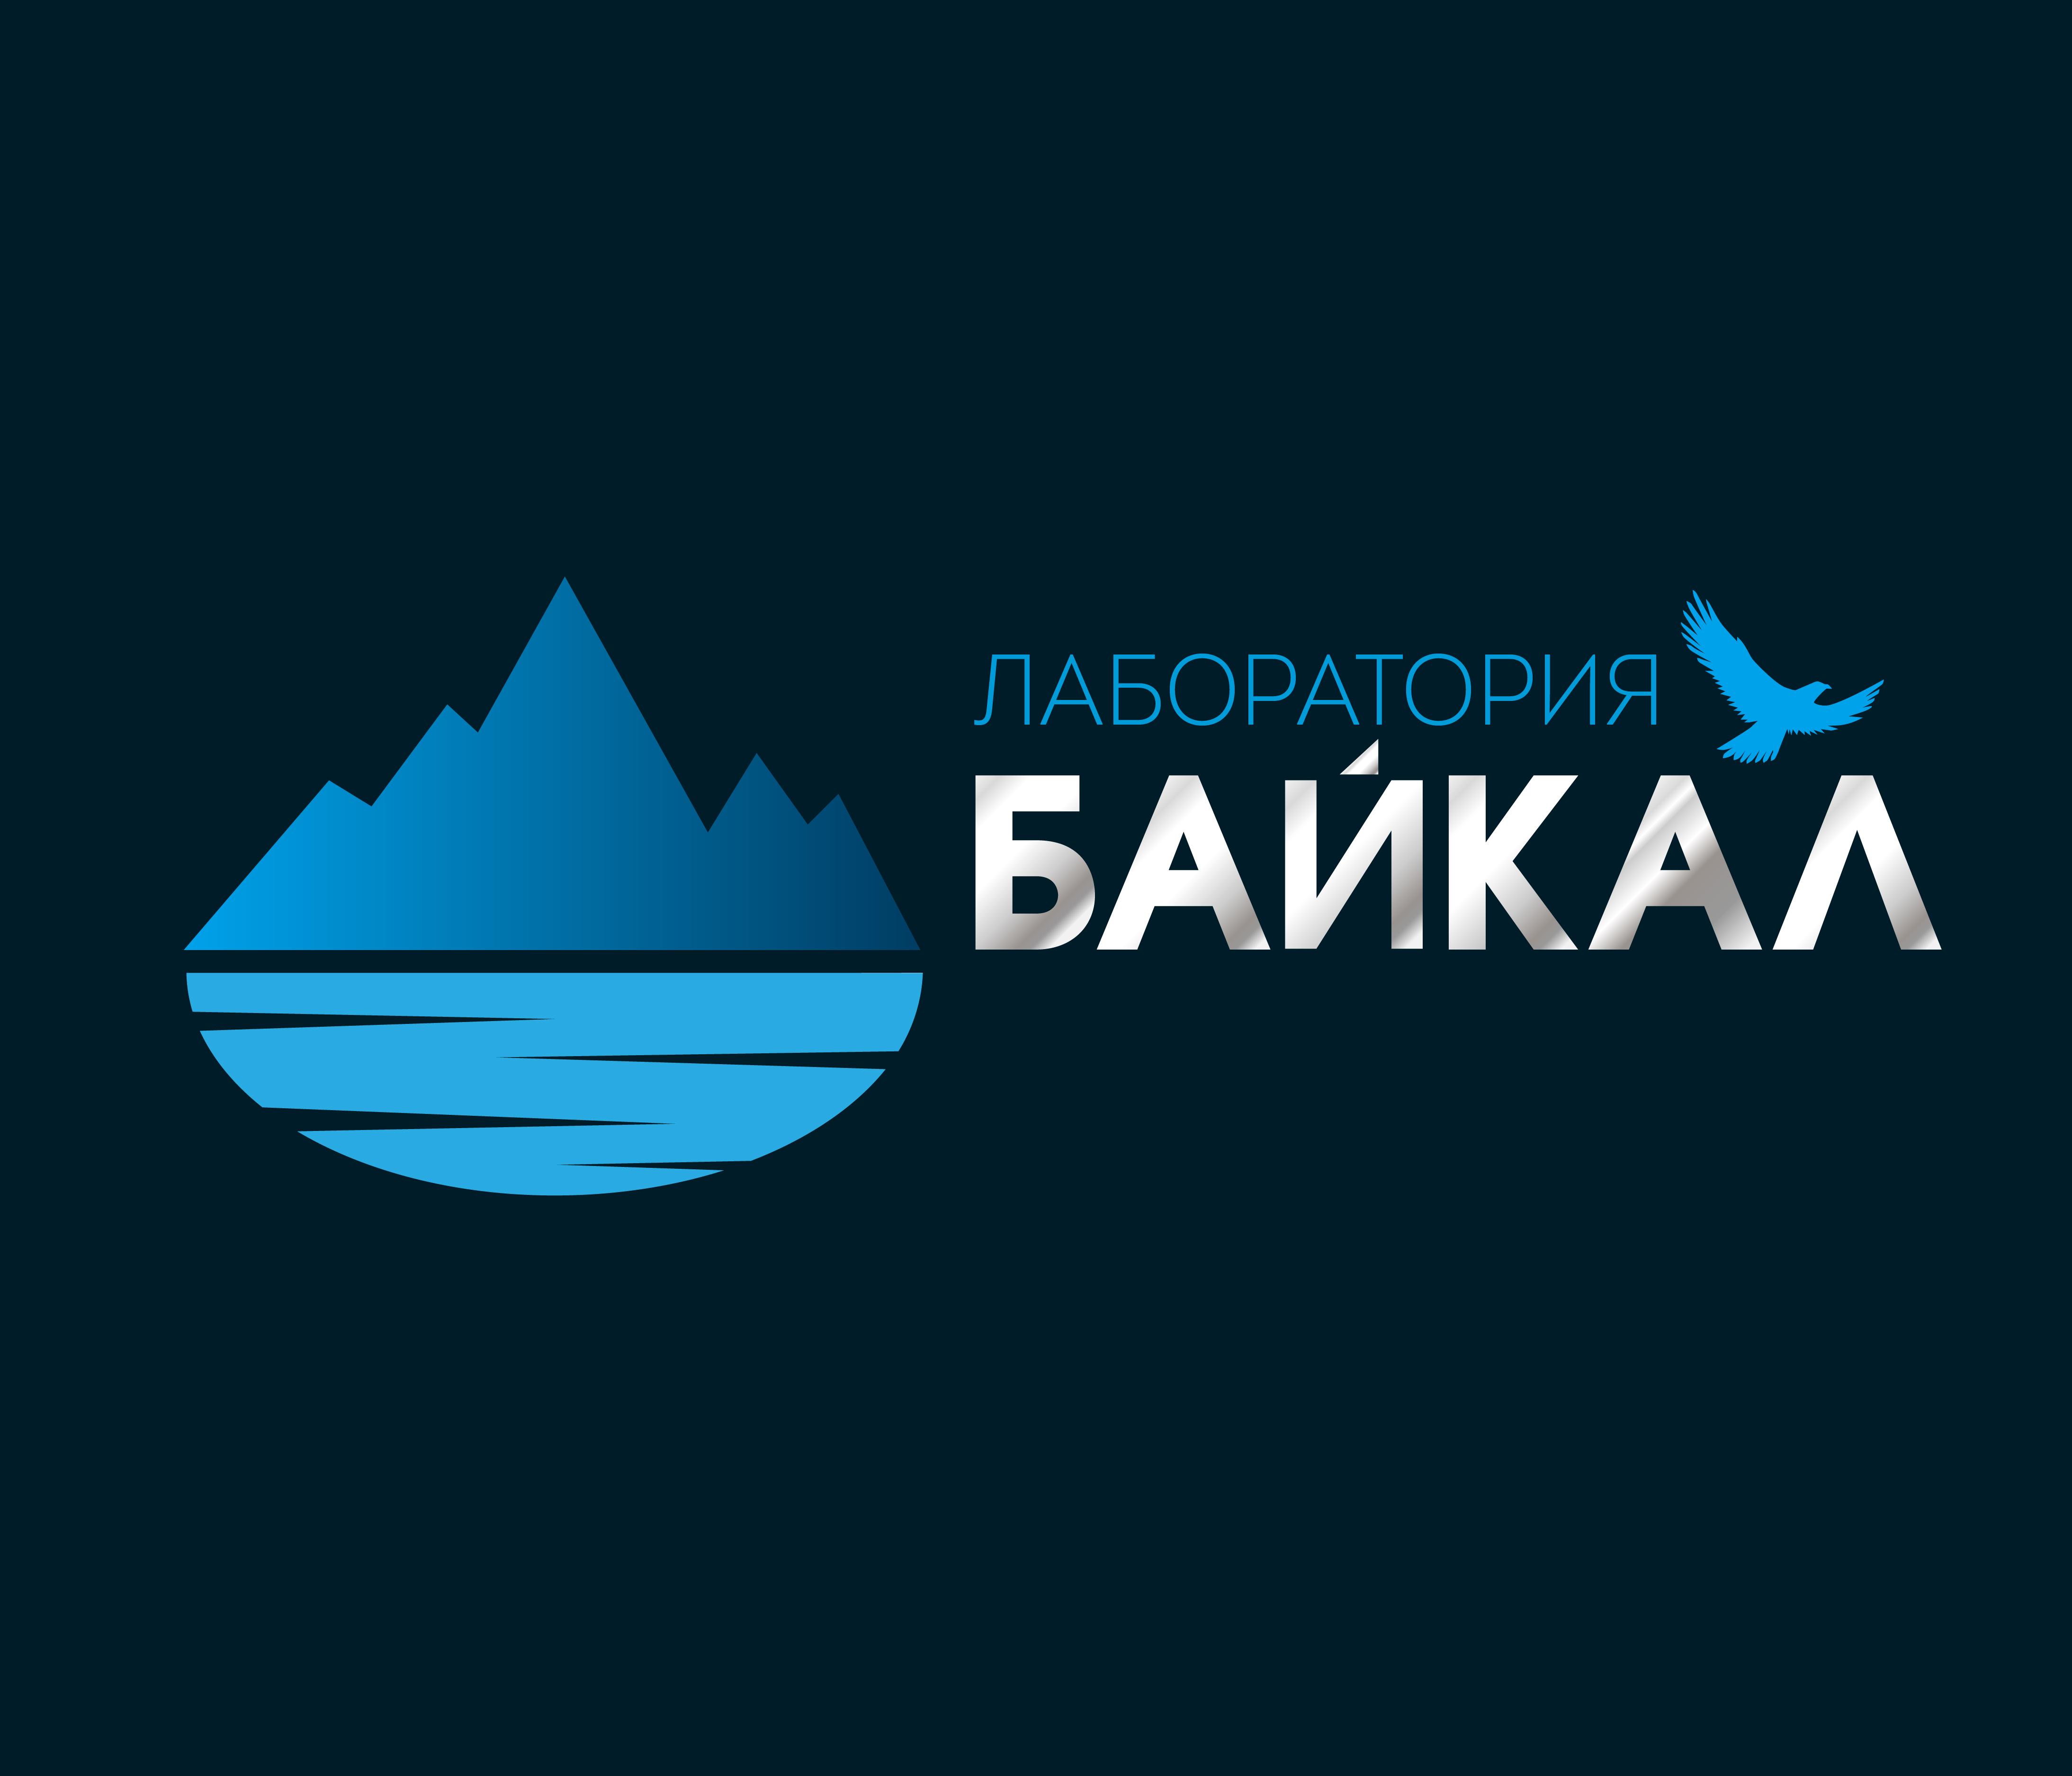 Разработка логотипа торговой марки фото f_216596a83119c678.jpg